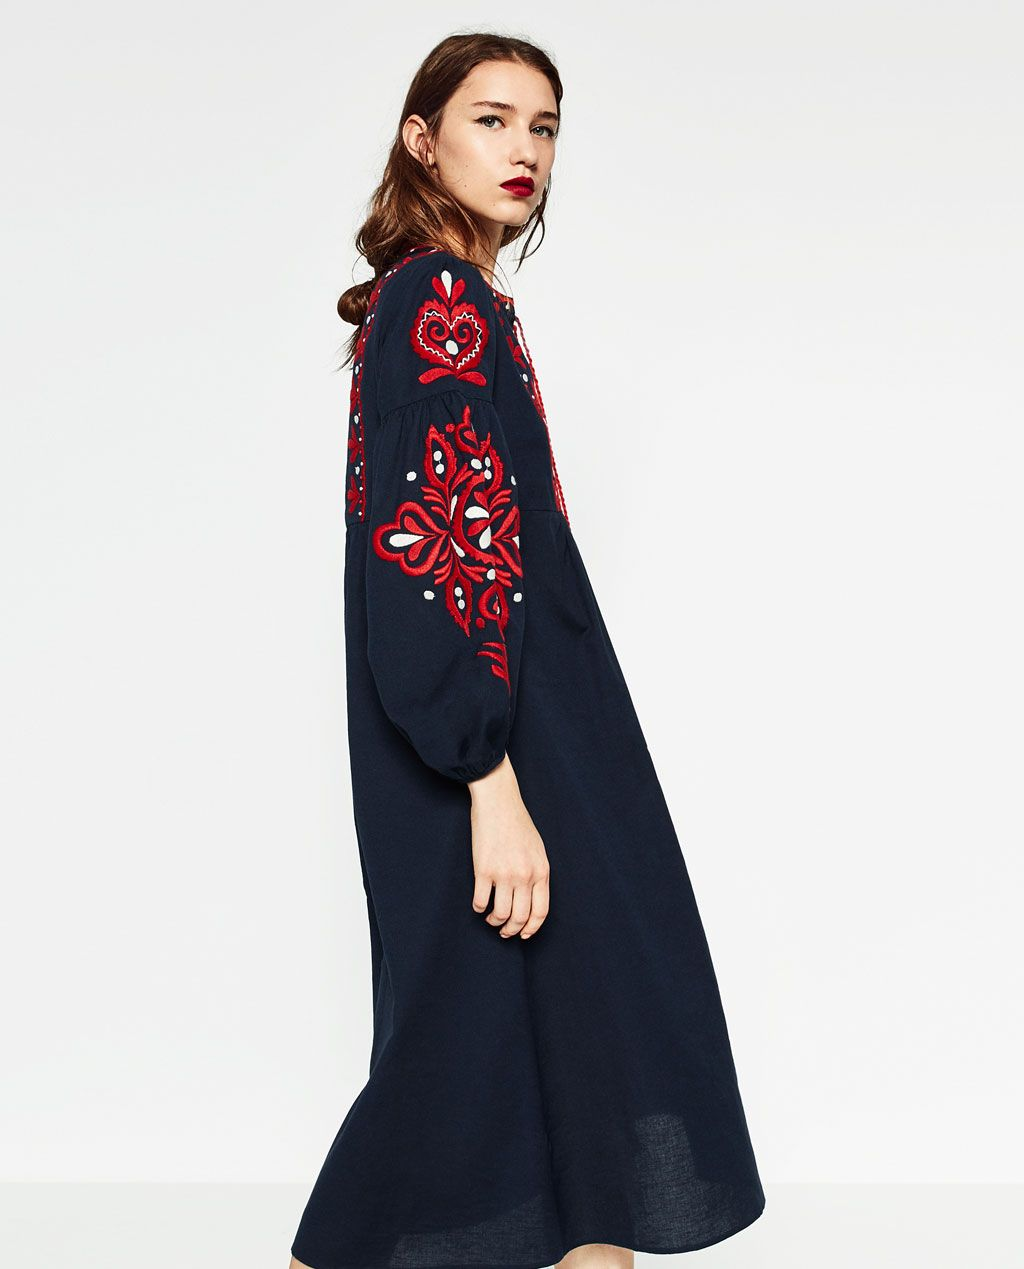 New dress!!! ZARA - WOMAN - LONG DRESS  Damen lange kleider